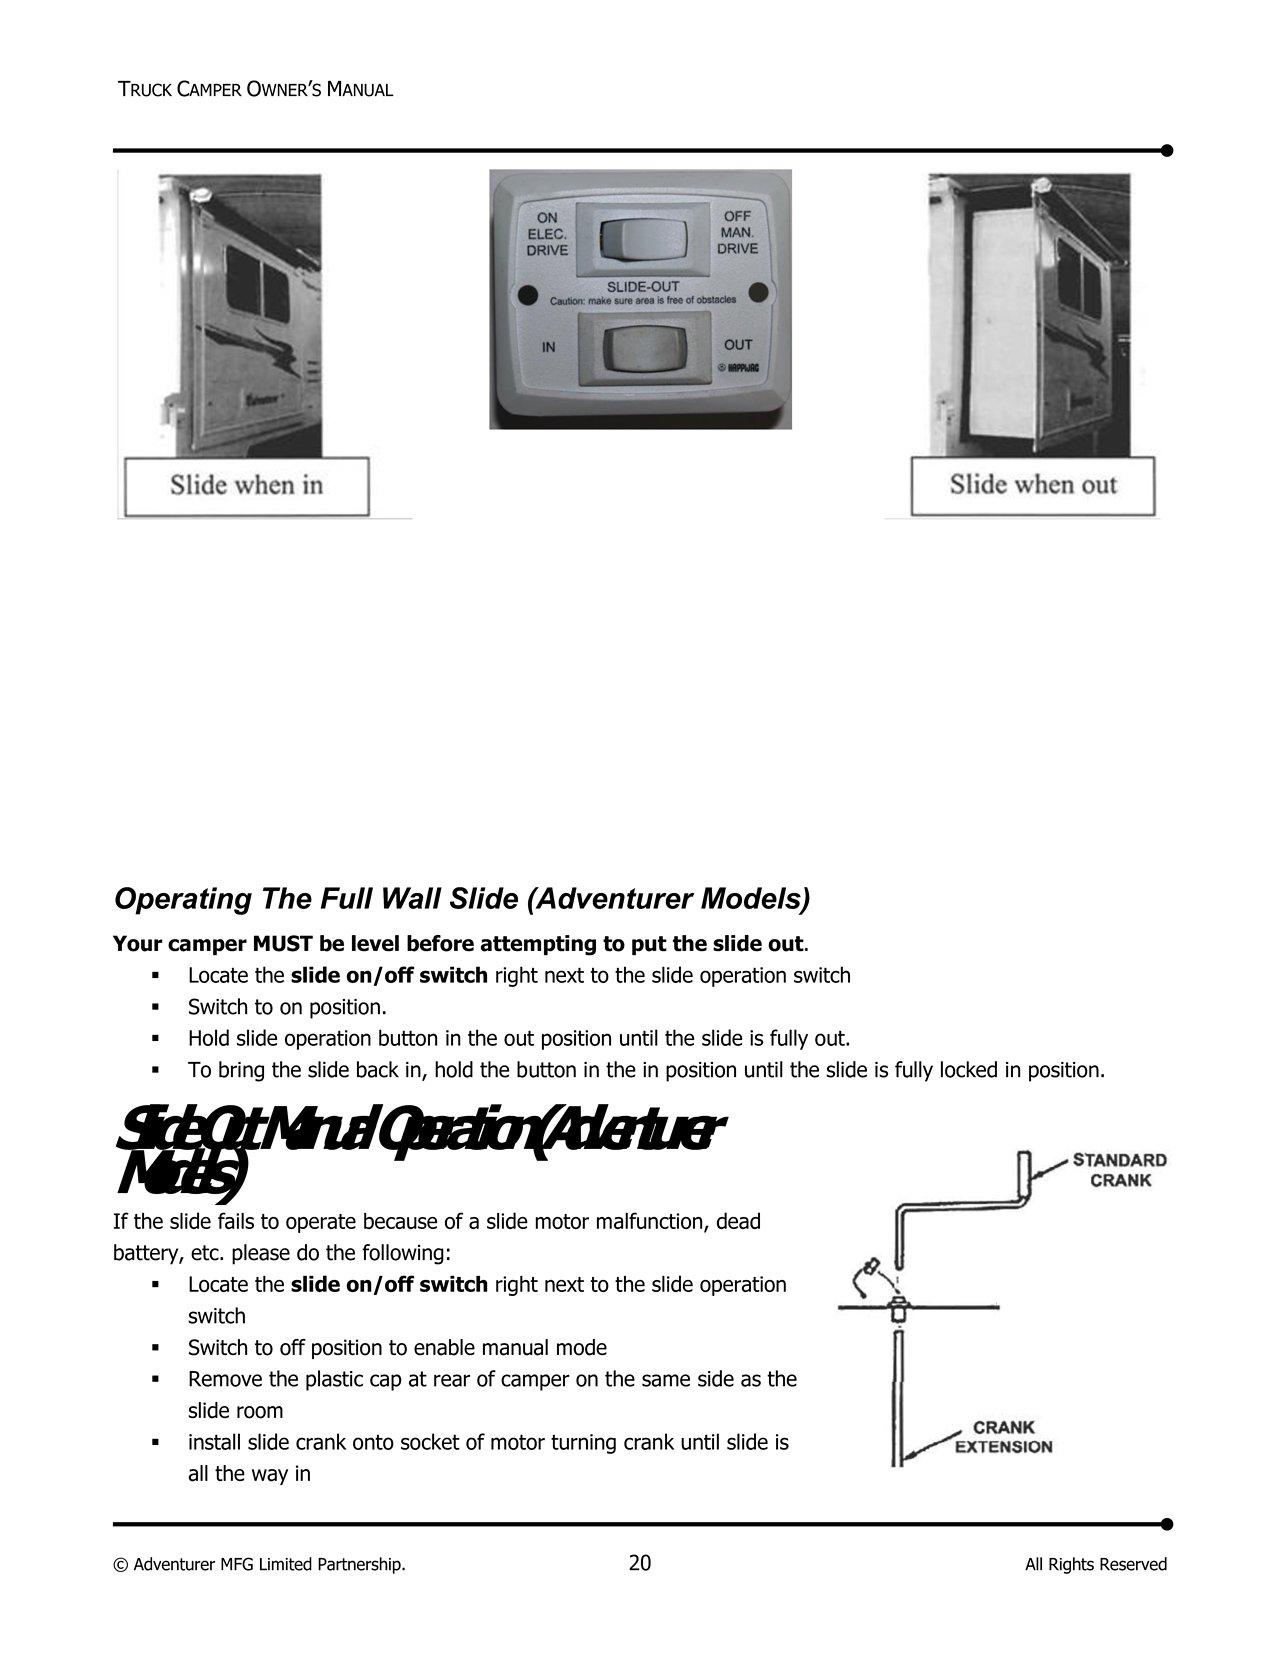 Camper Wiring Diagram Manual : Northstar truck camper wiring diagram repair